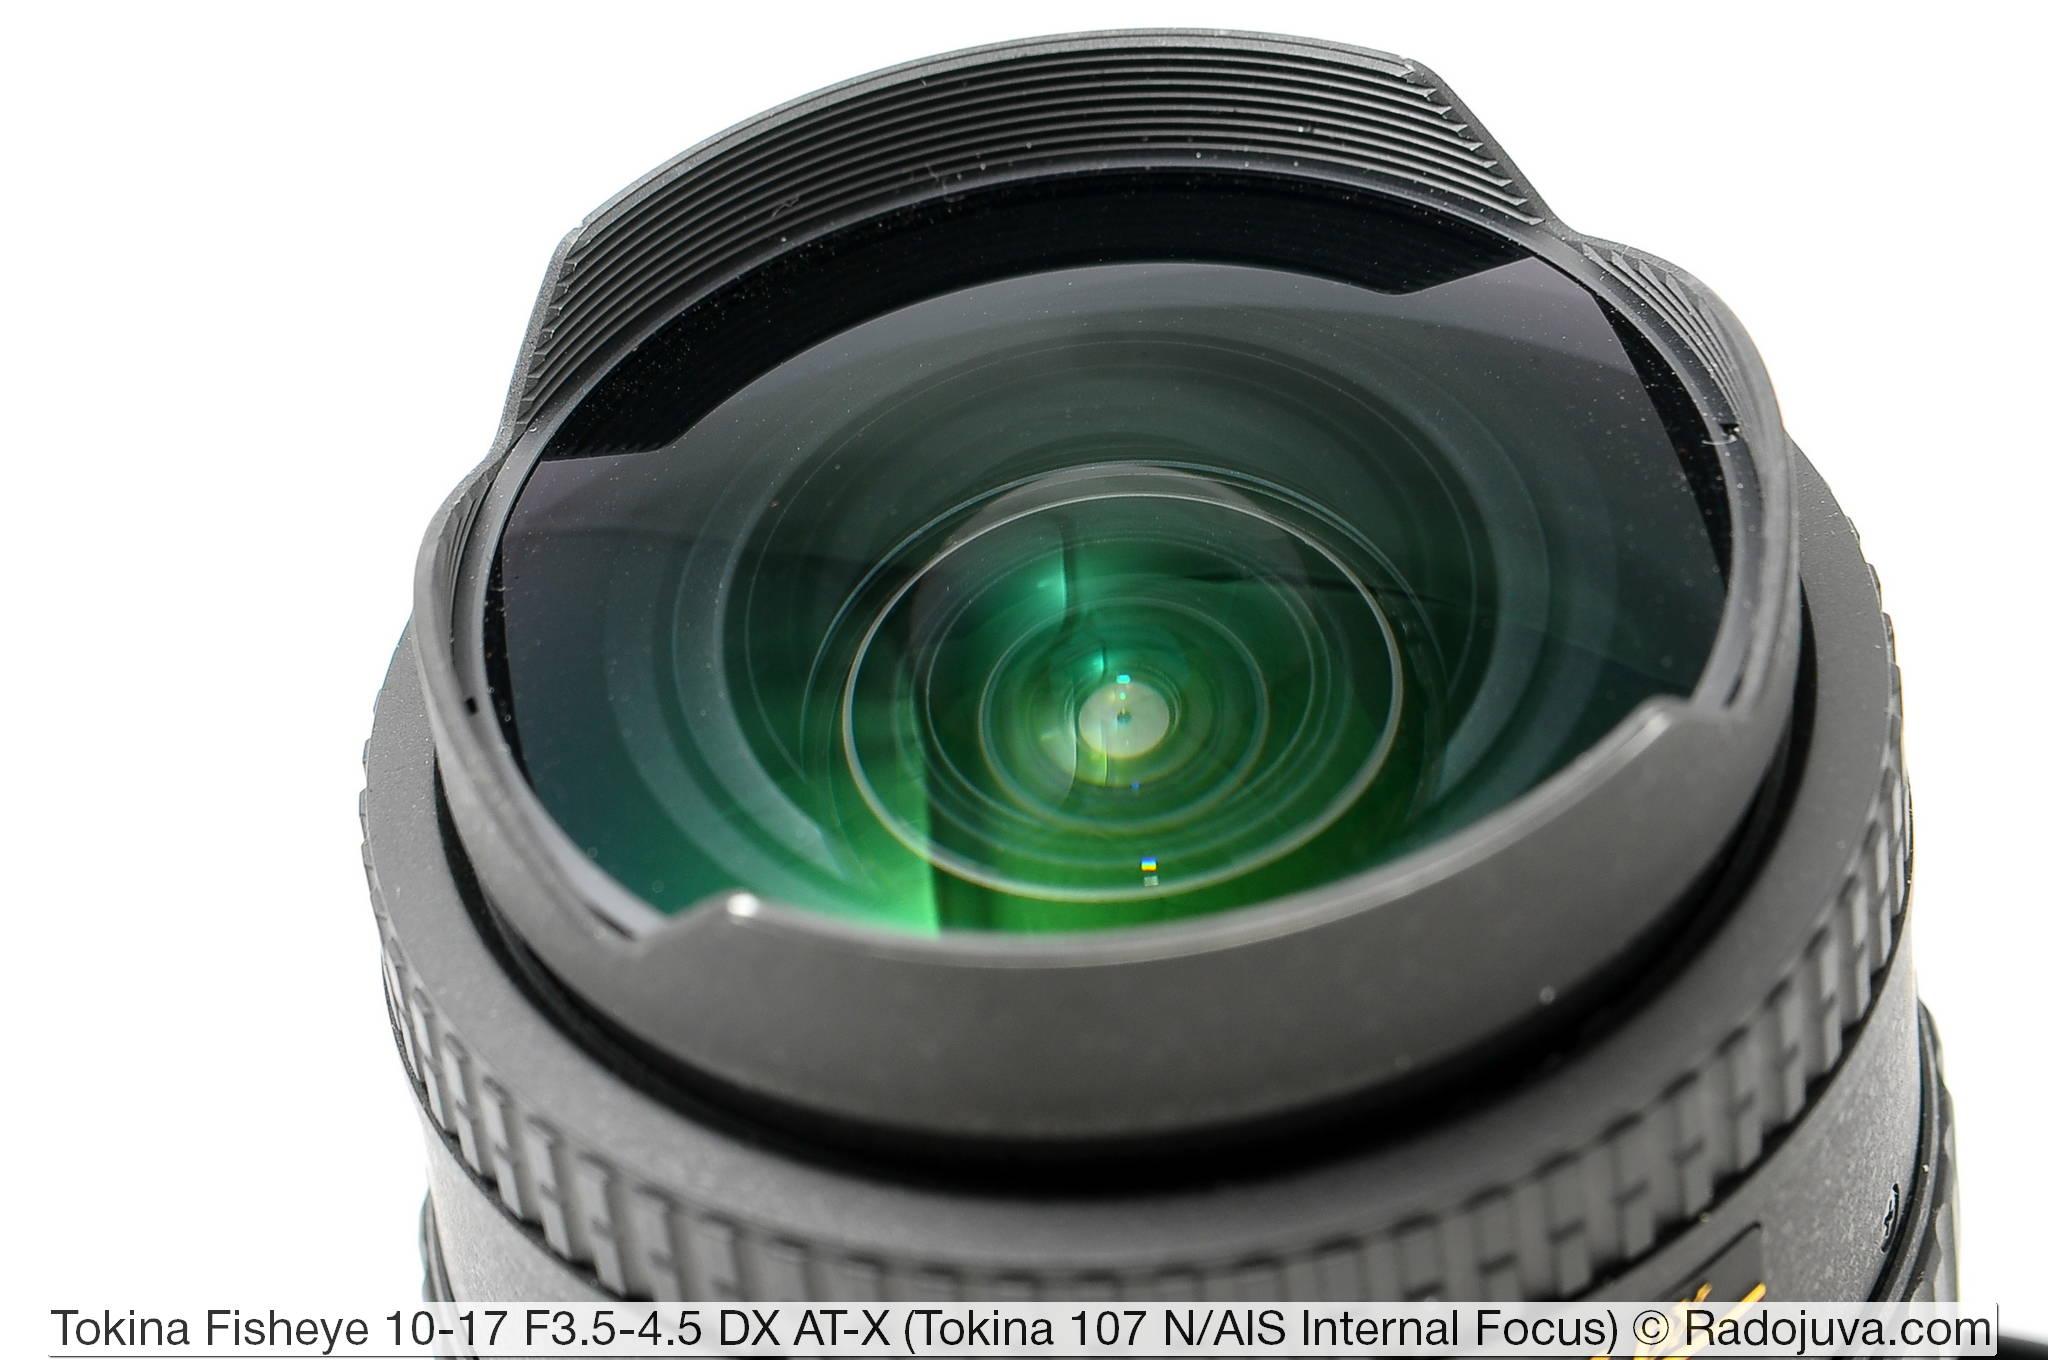 Tokina 107 Fisheye 10-17mm F3.5-4.5 DX AT-X Internal Focus